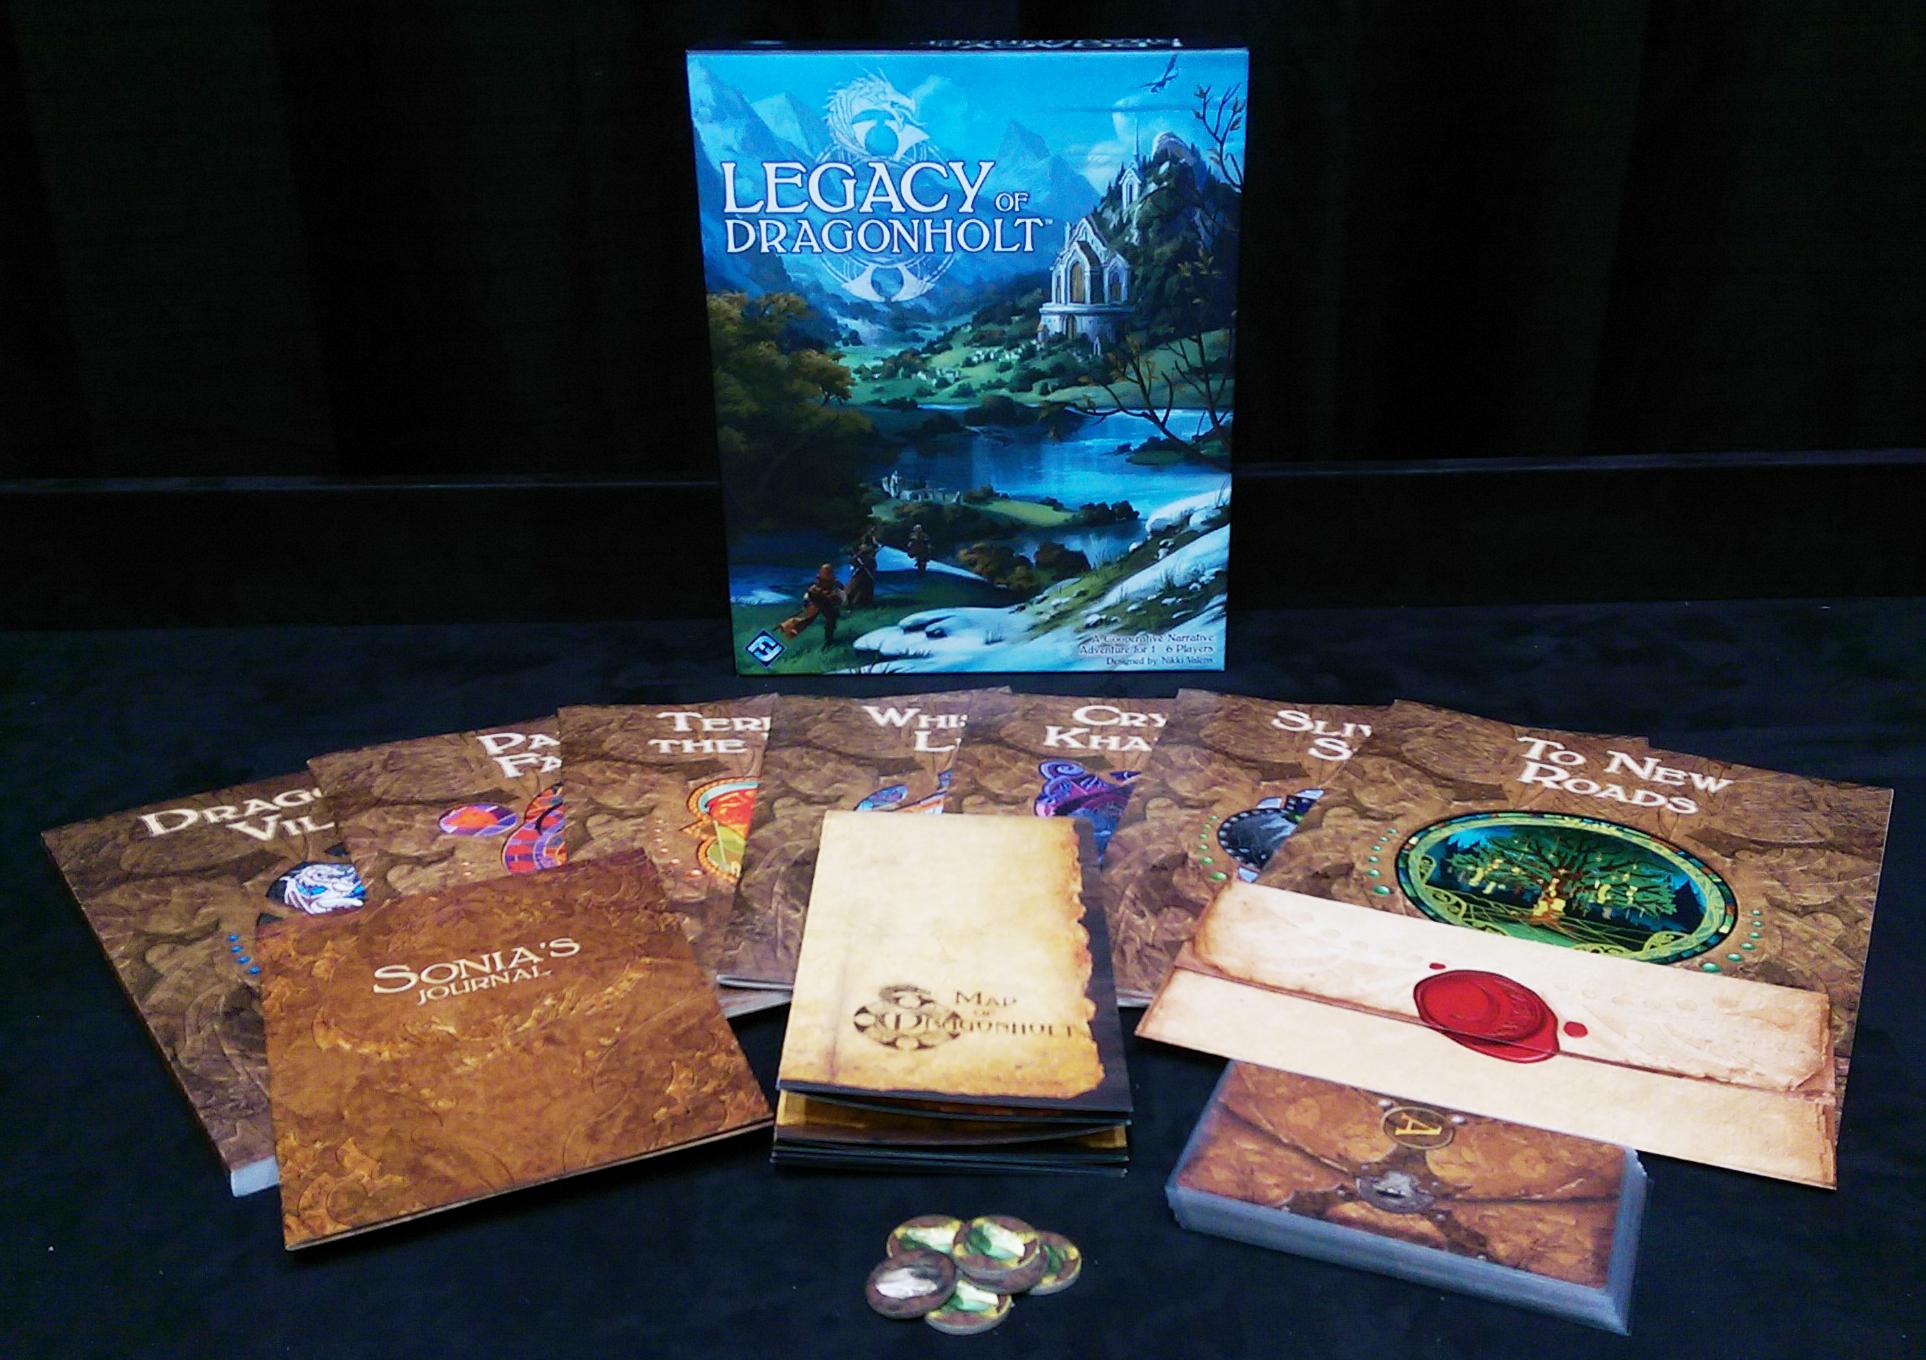 Legacy of dragonholt mid 1